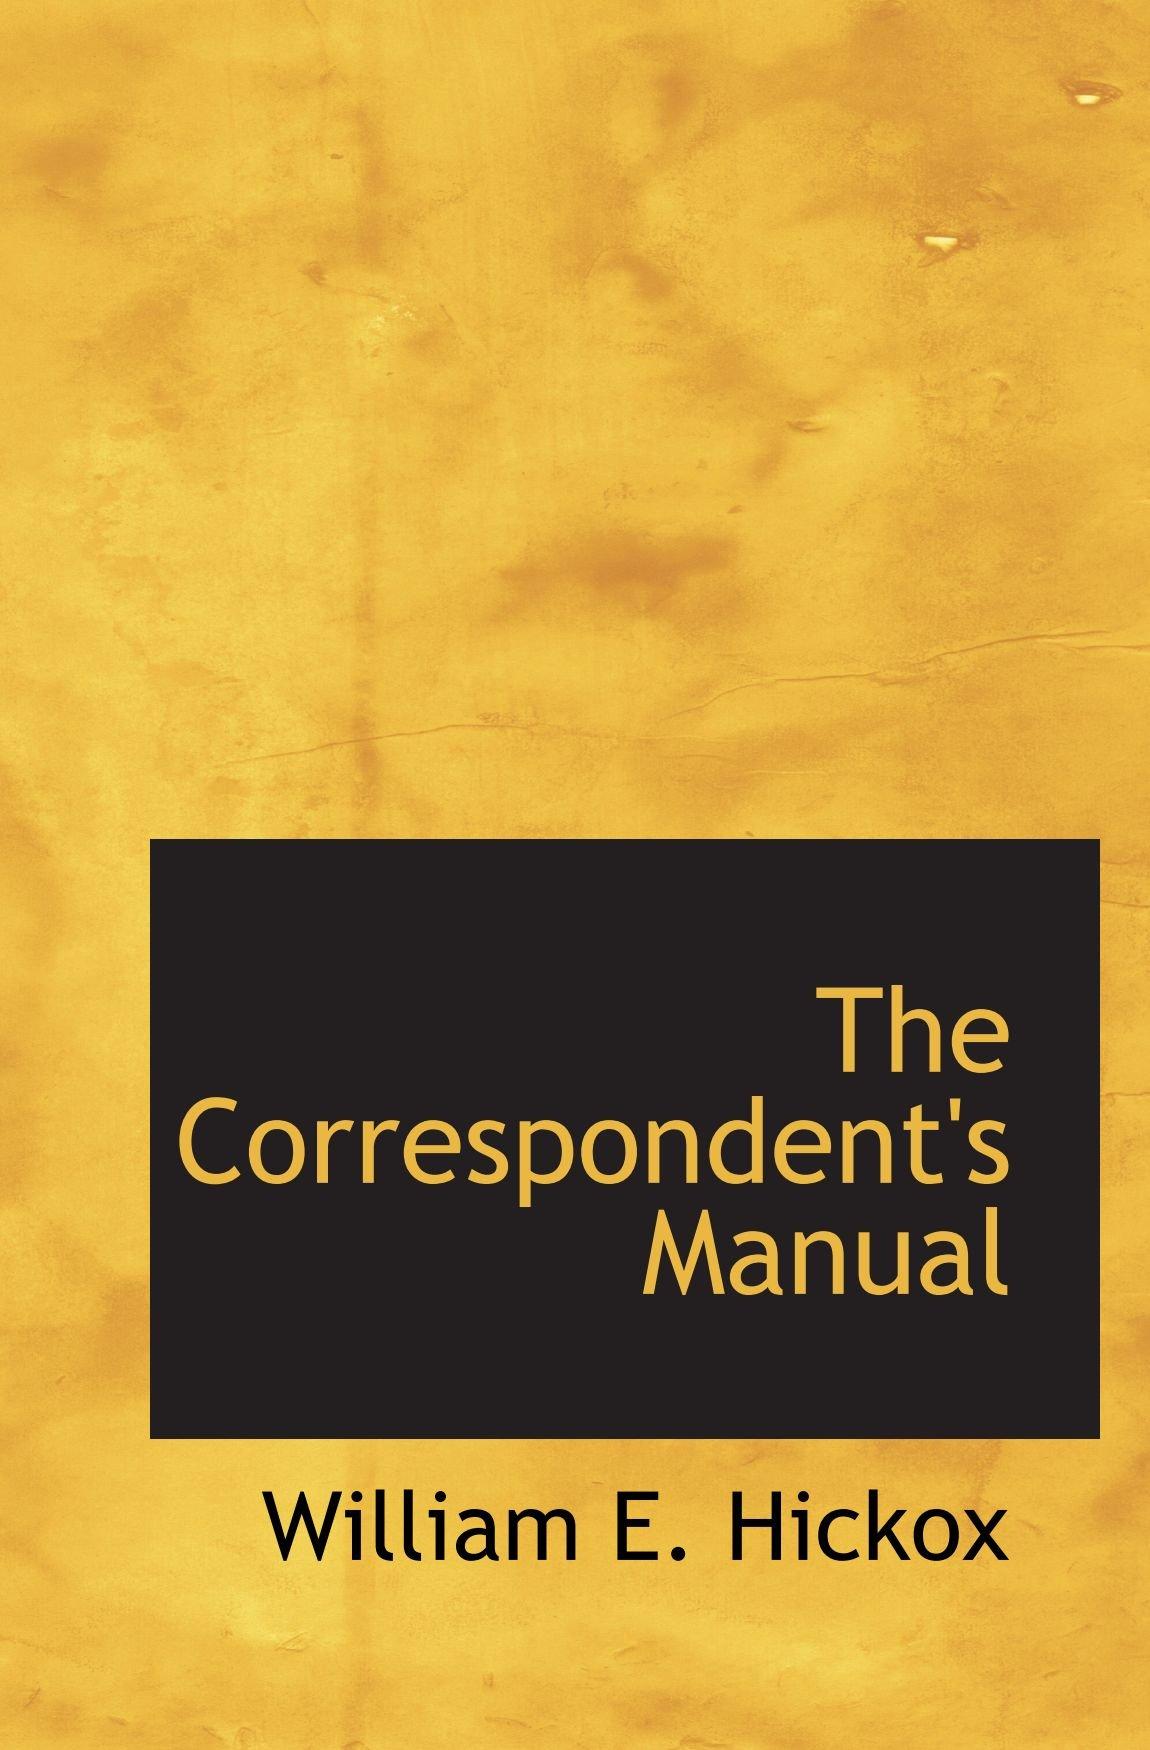 The Correspondents Manual Paperback – June 3, 2009